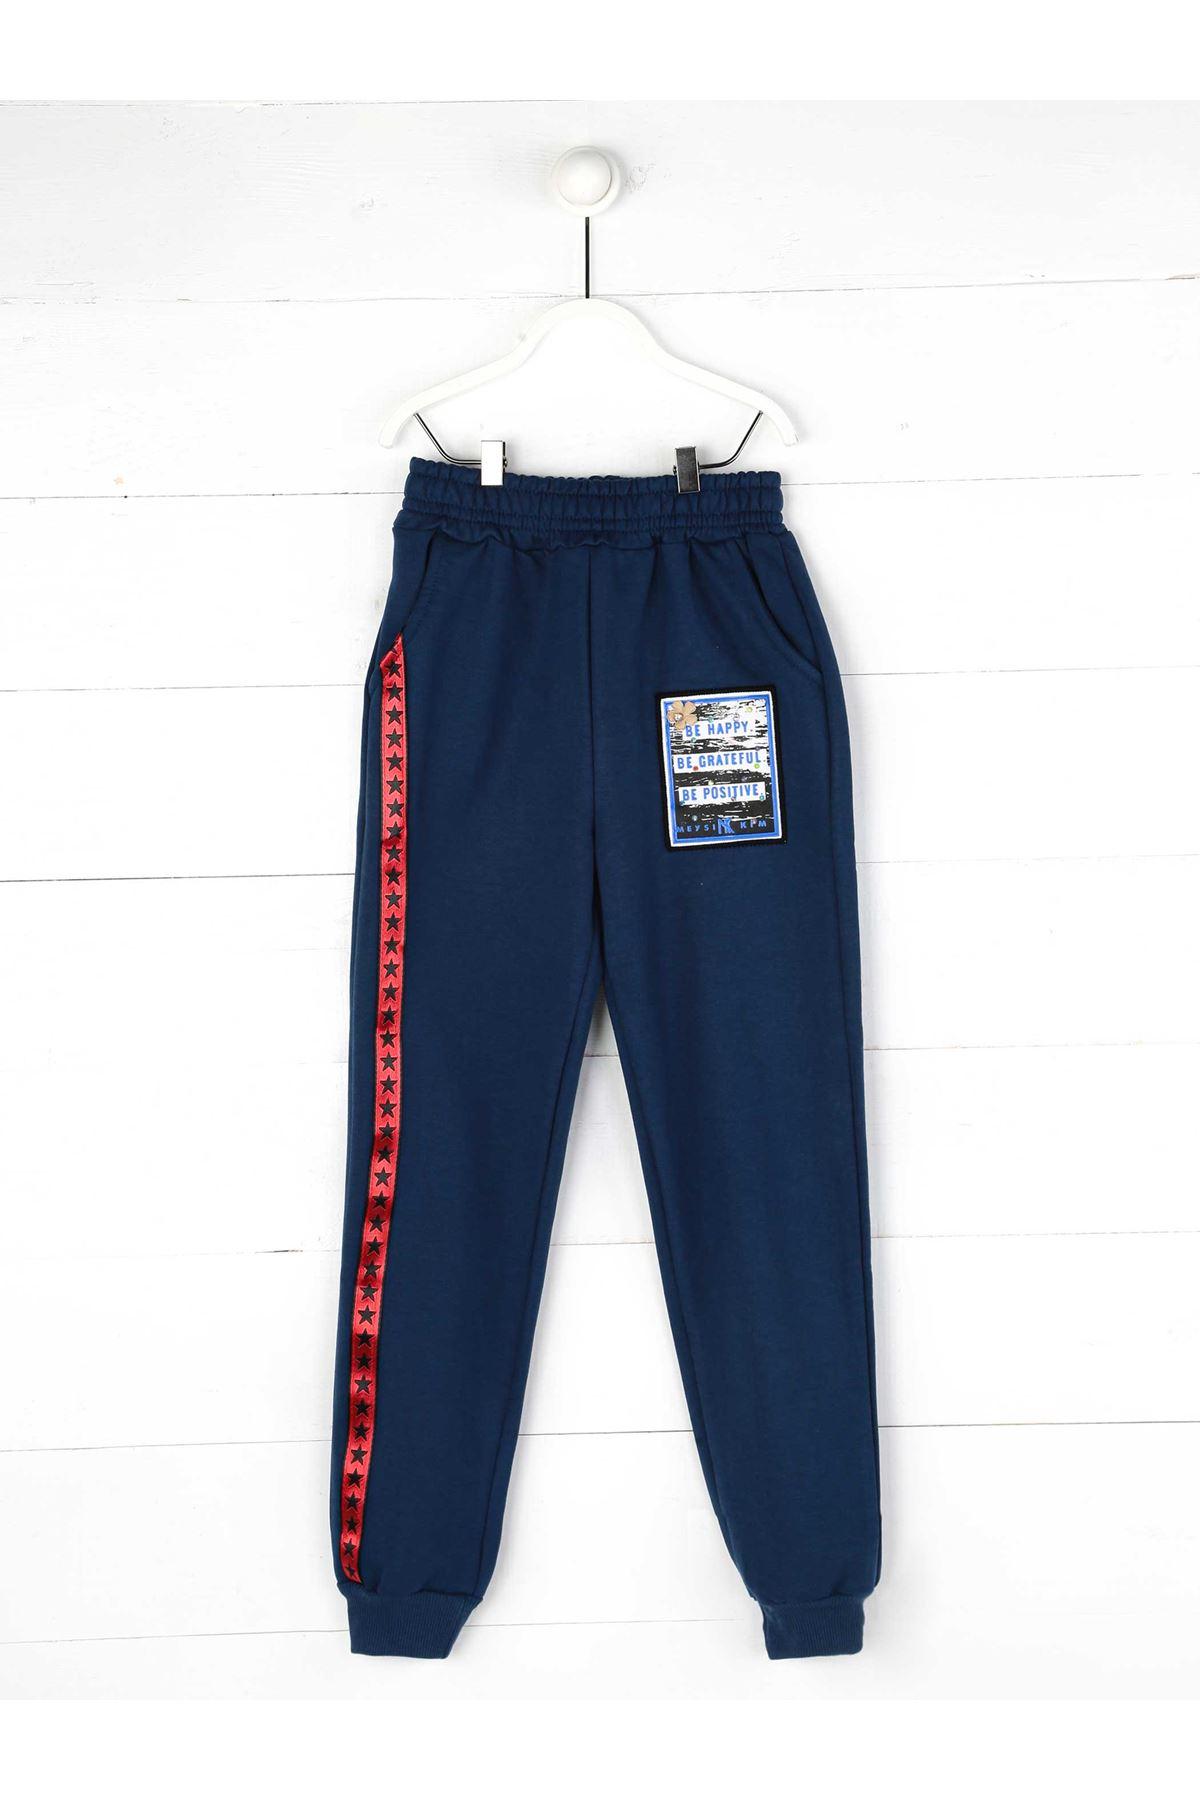 Navy blue Seasonal Girl Boy Sweatpants